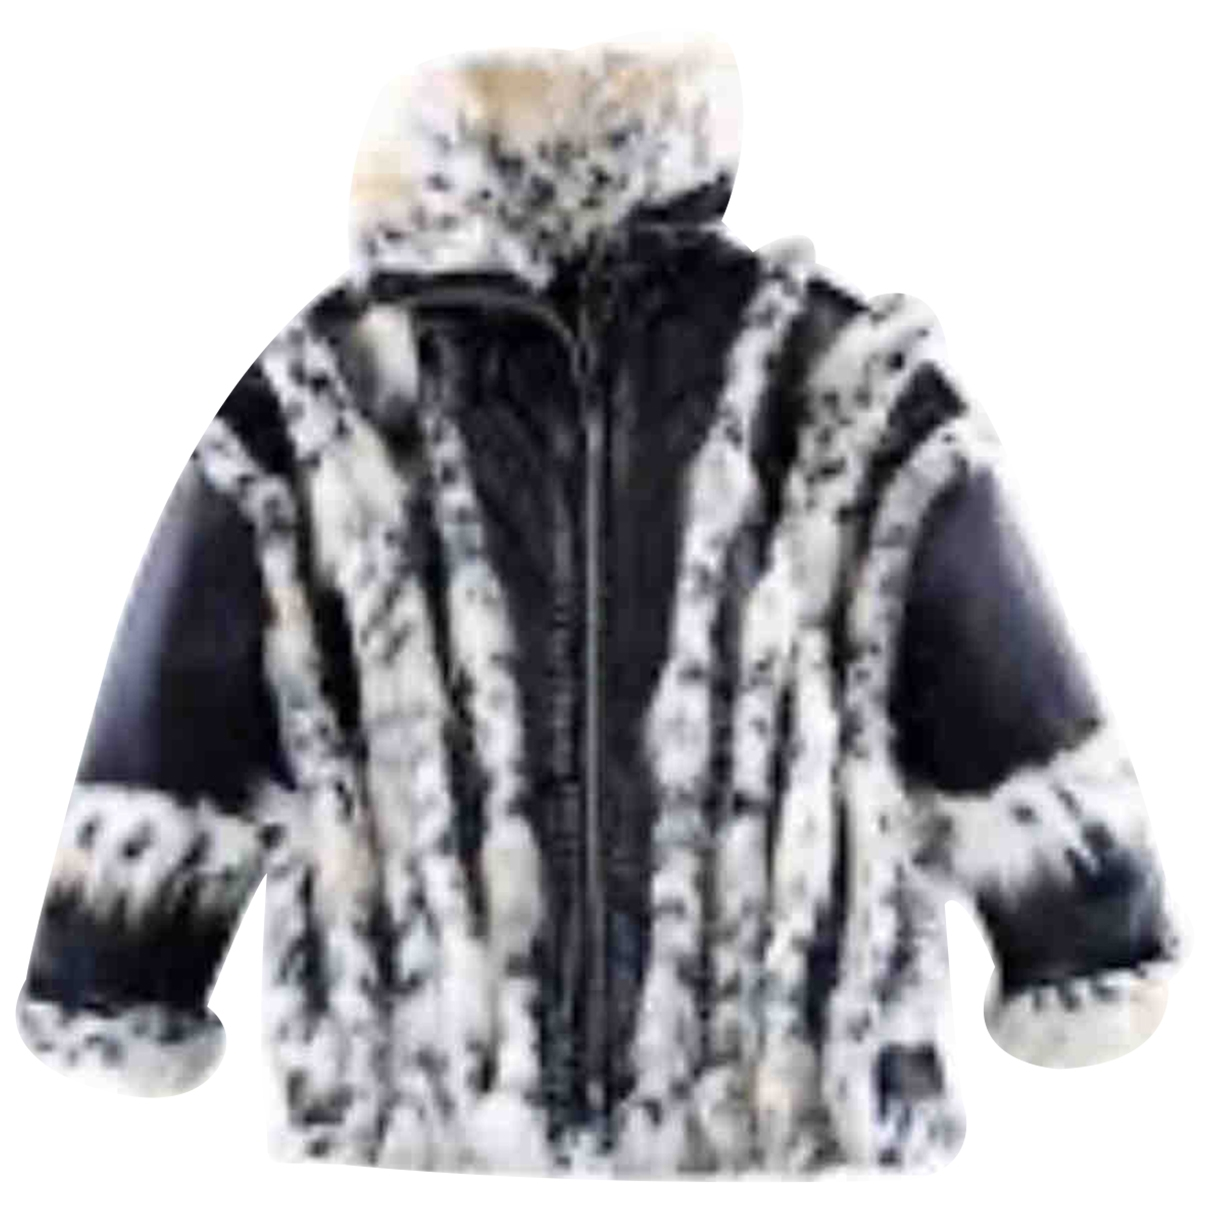 Giambattista Valli X H&m \N Black Leather jacket for Women S International